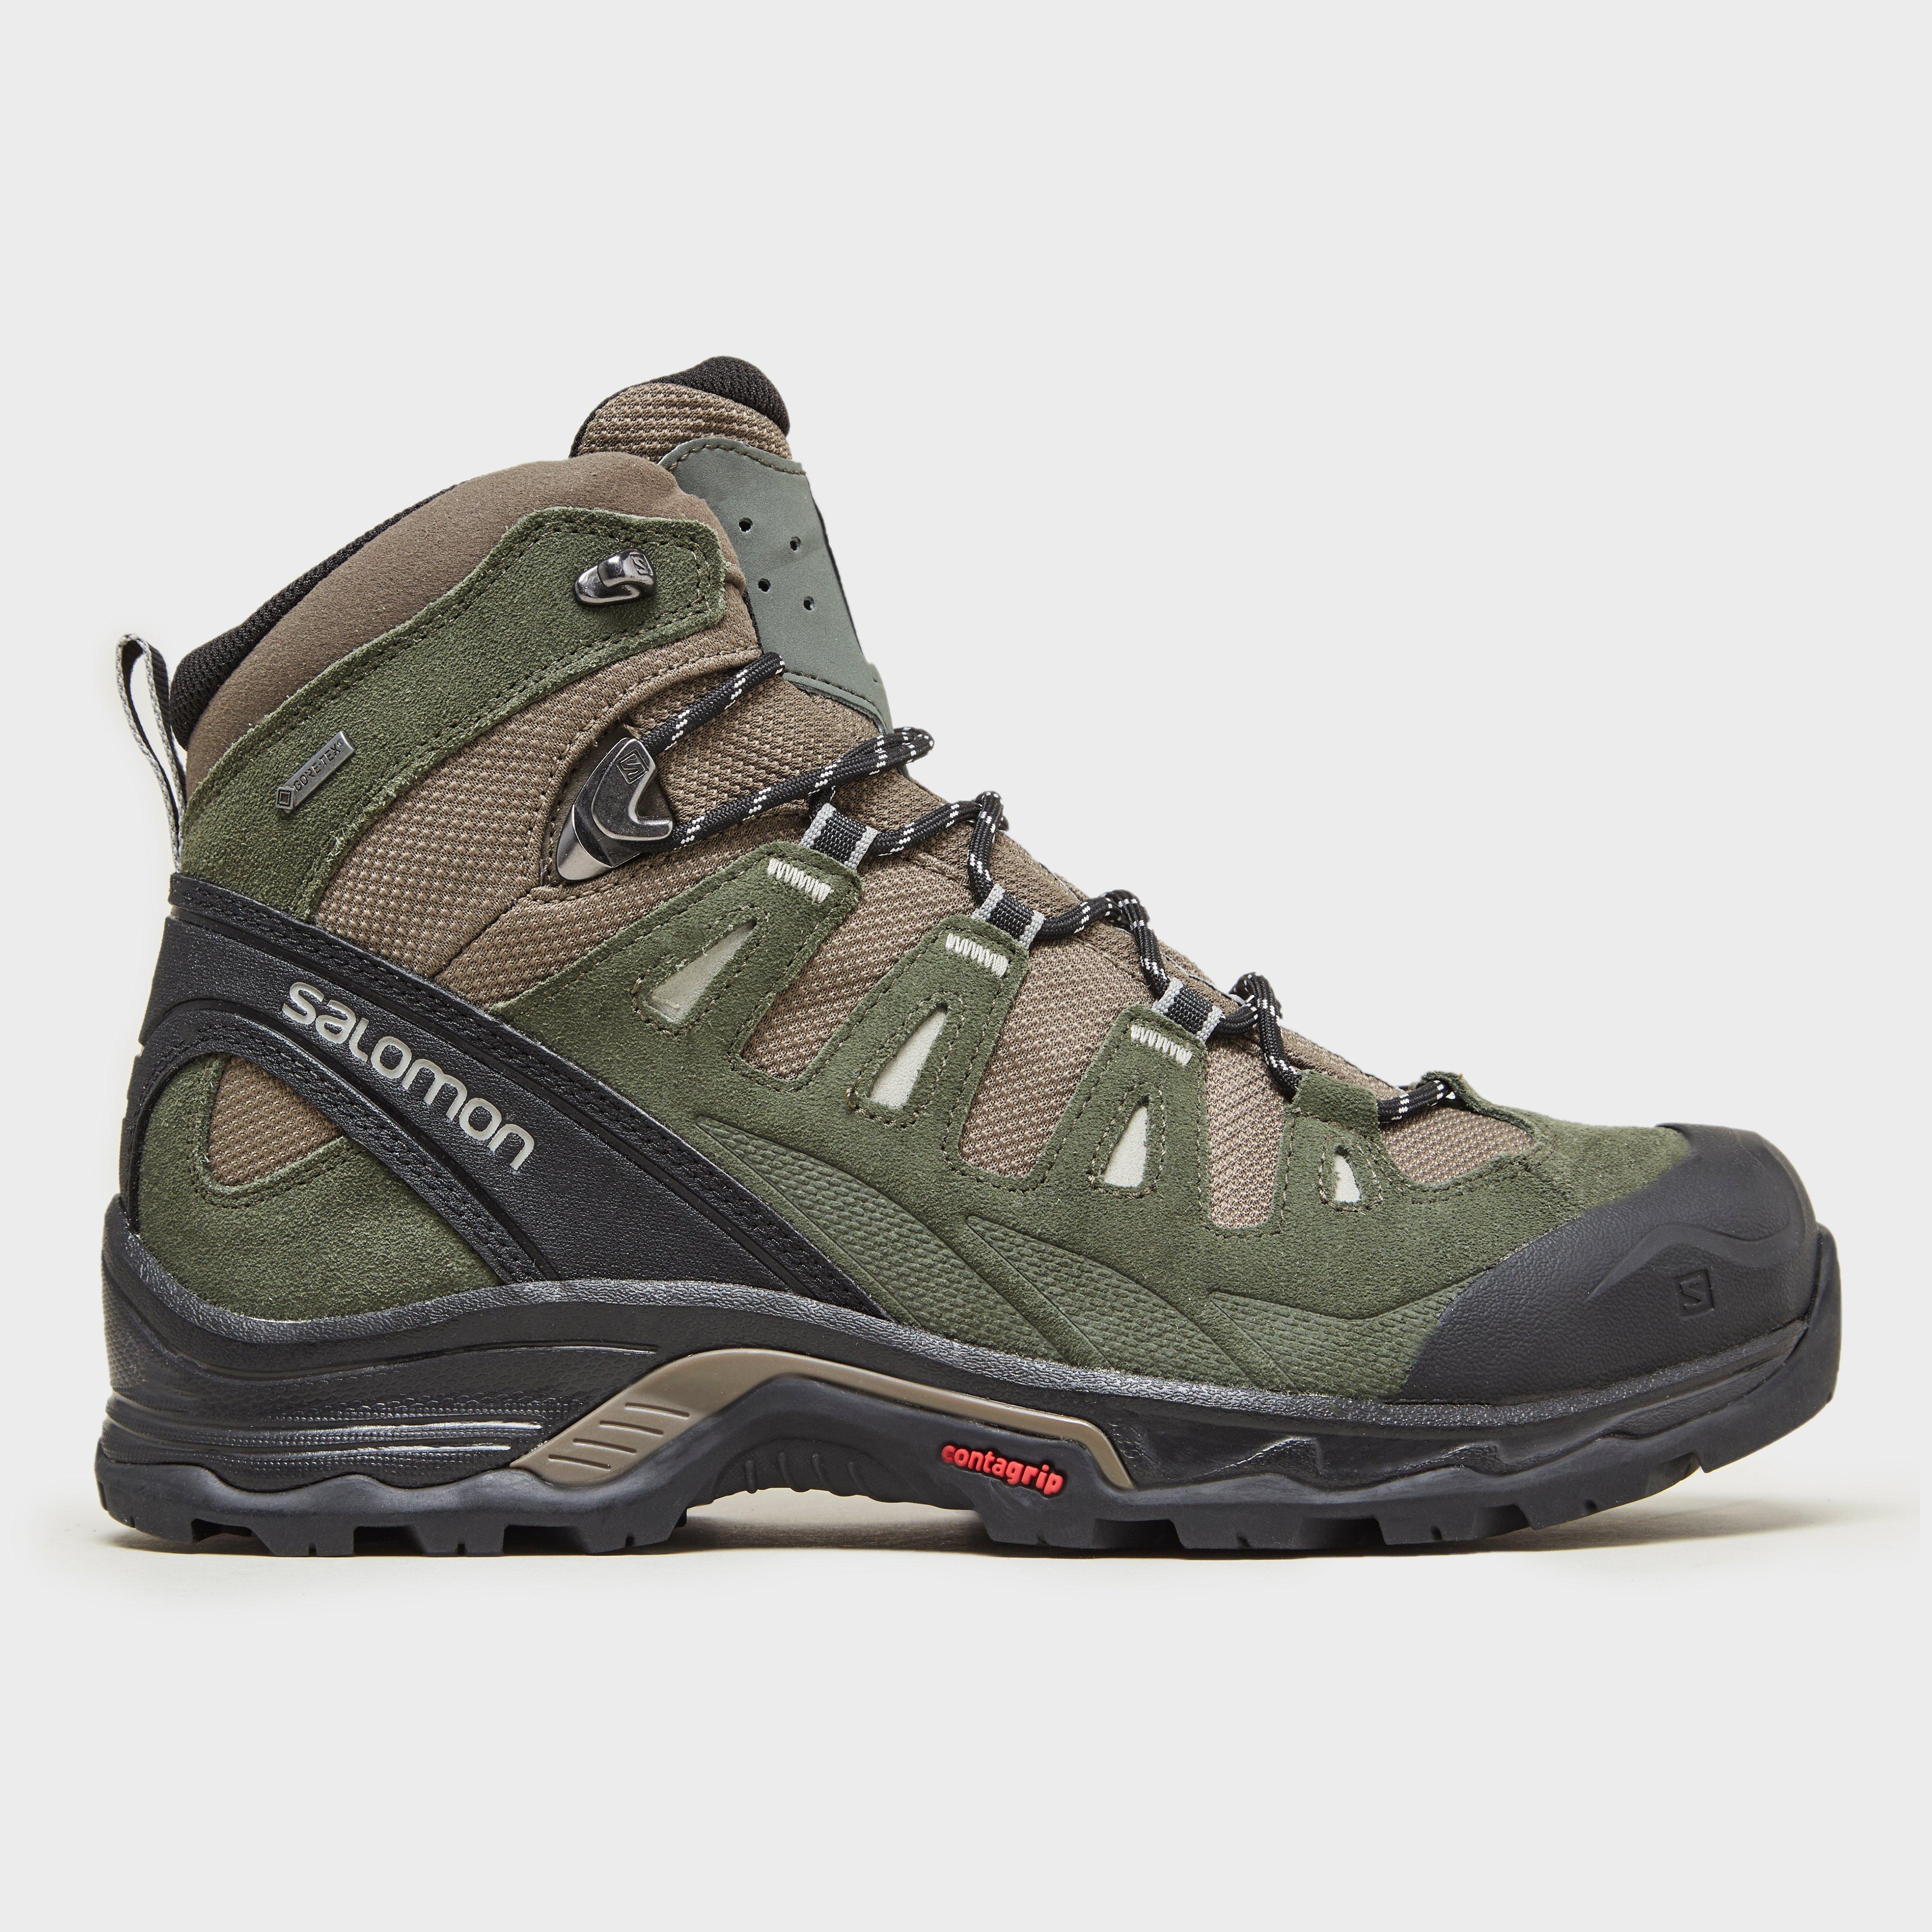 salomon menu0027s quest prime gore-tex® walking boots sxuarba